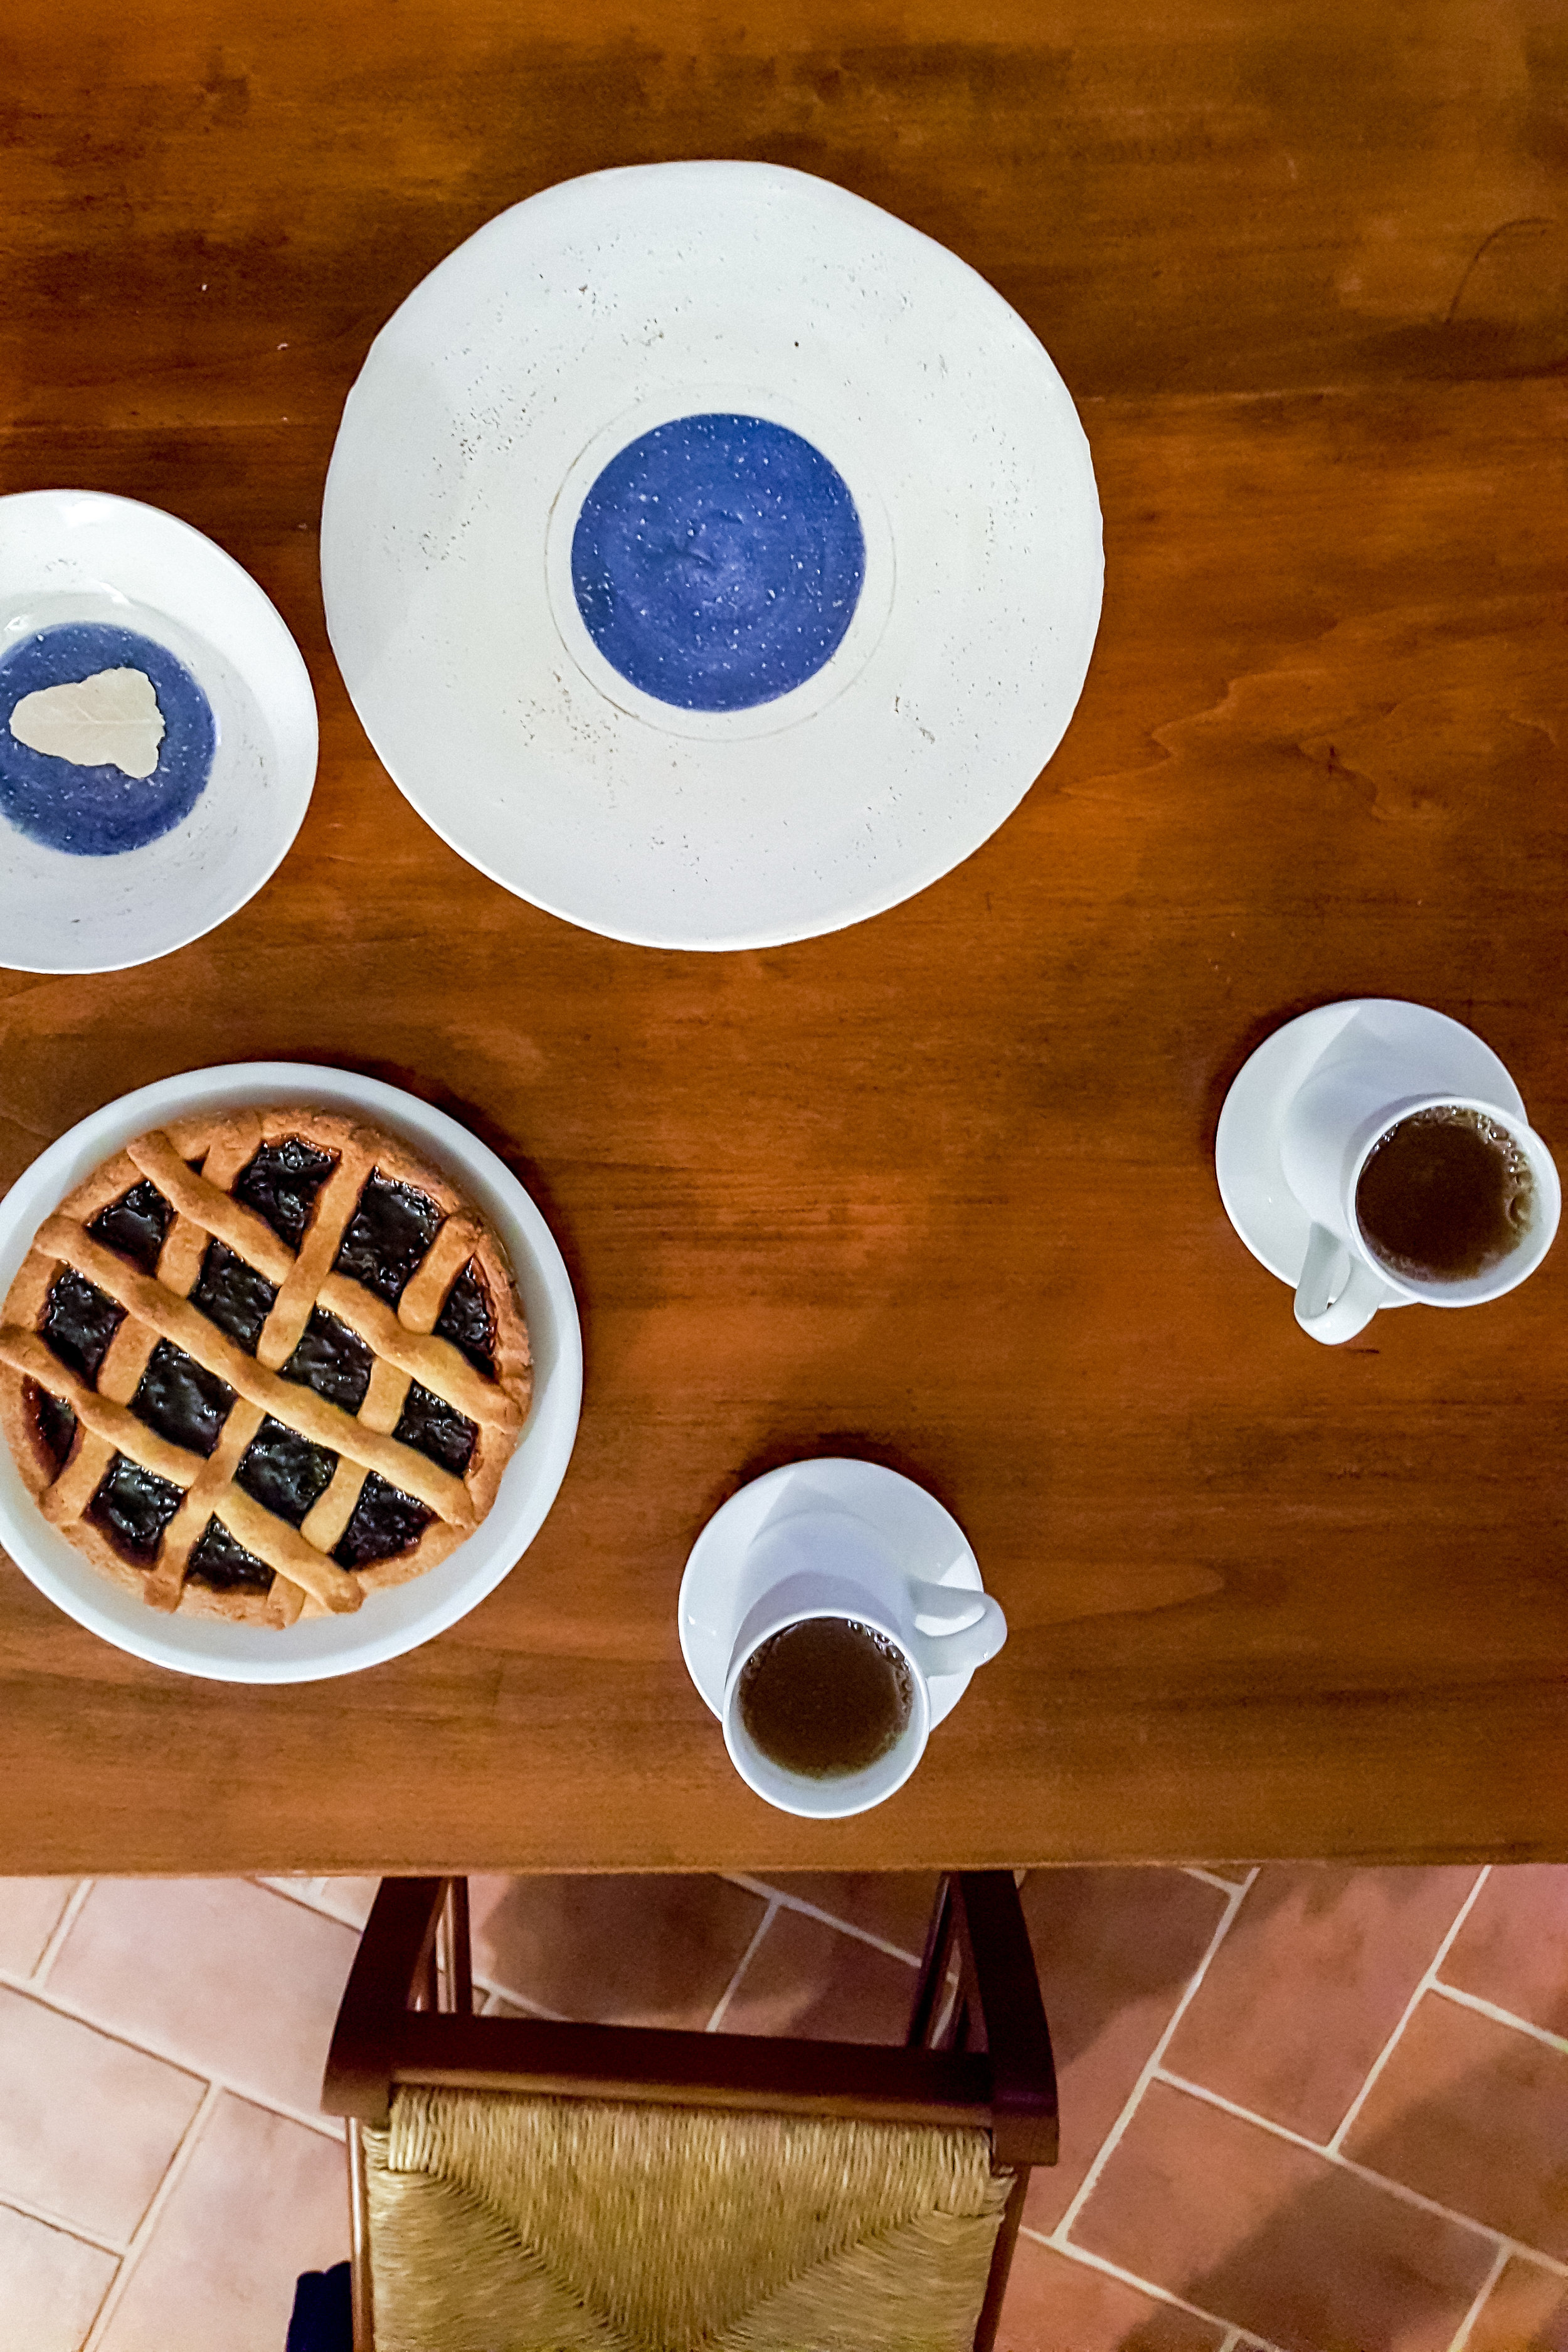 Simona Baldelli ceramics with the blue dot